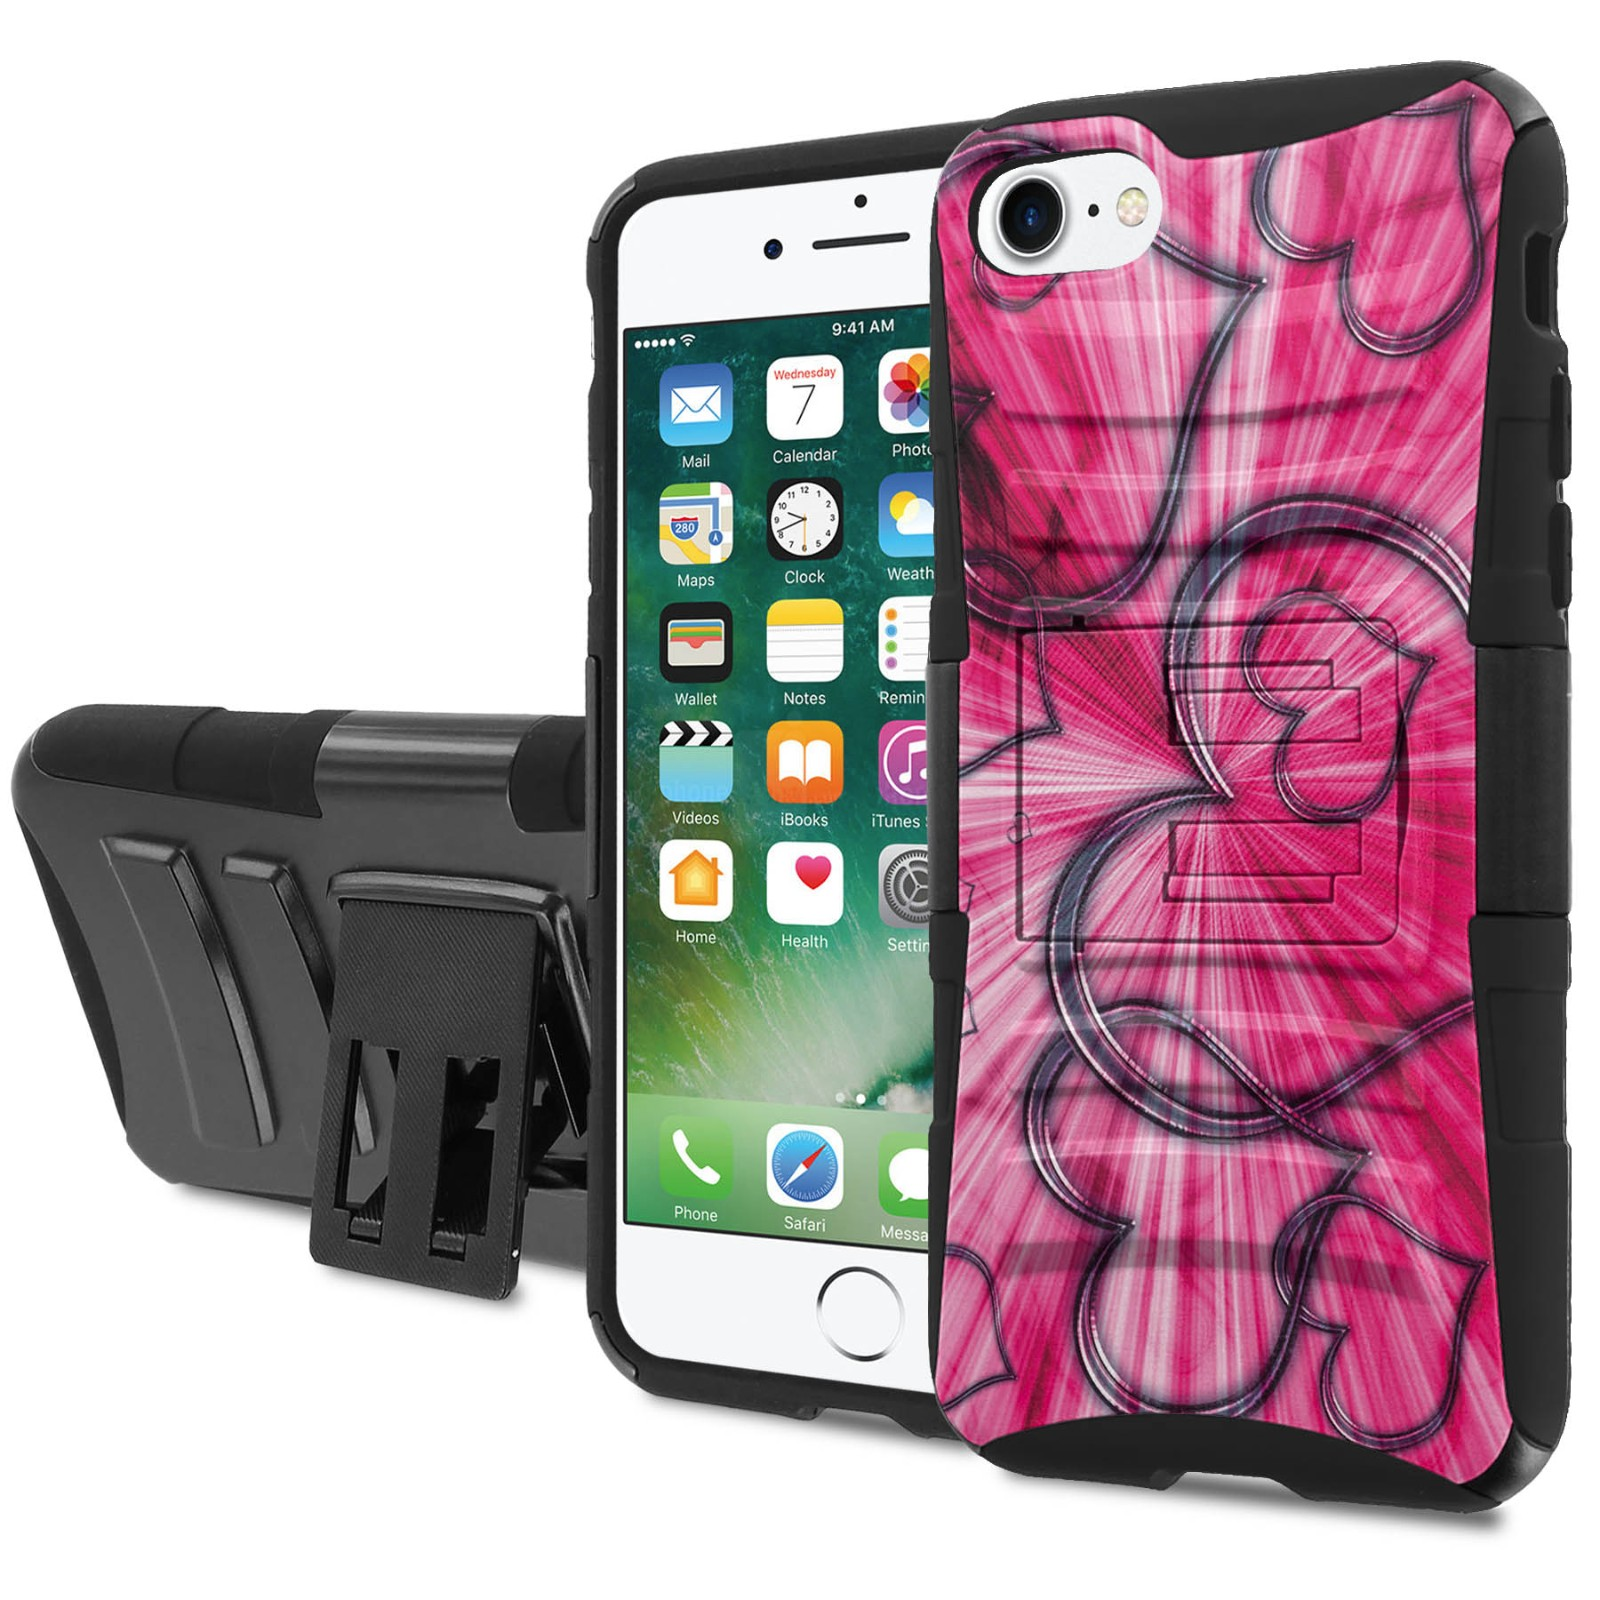 iphone 7 7s defense armor case holster kickstand. Black Bedroom Furniture Sets. Home Design Ideas